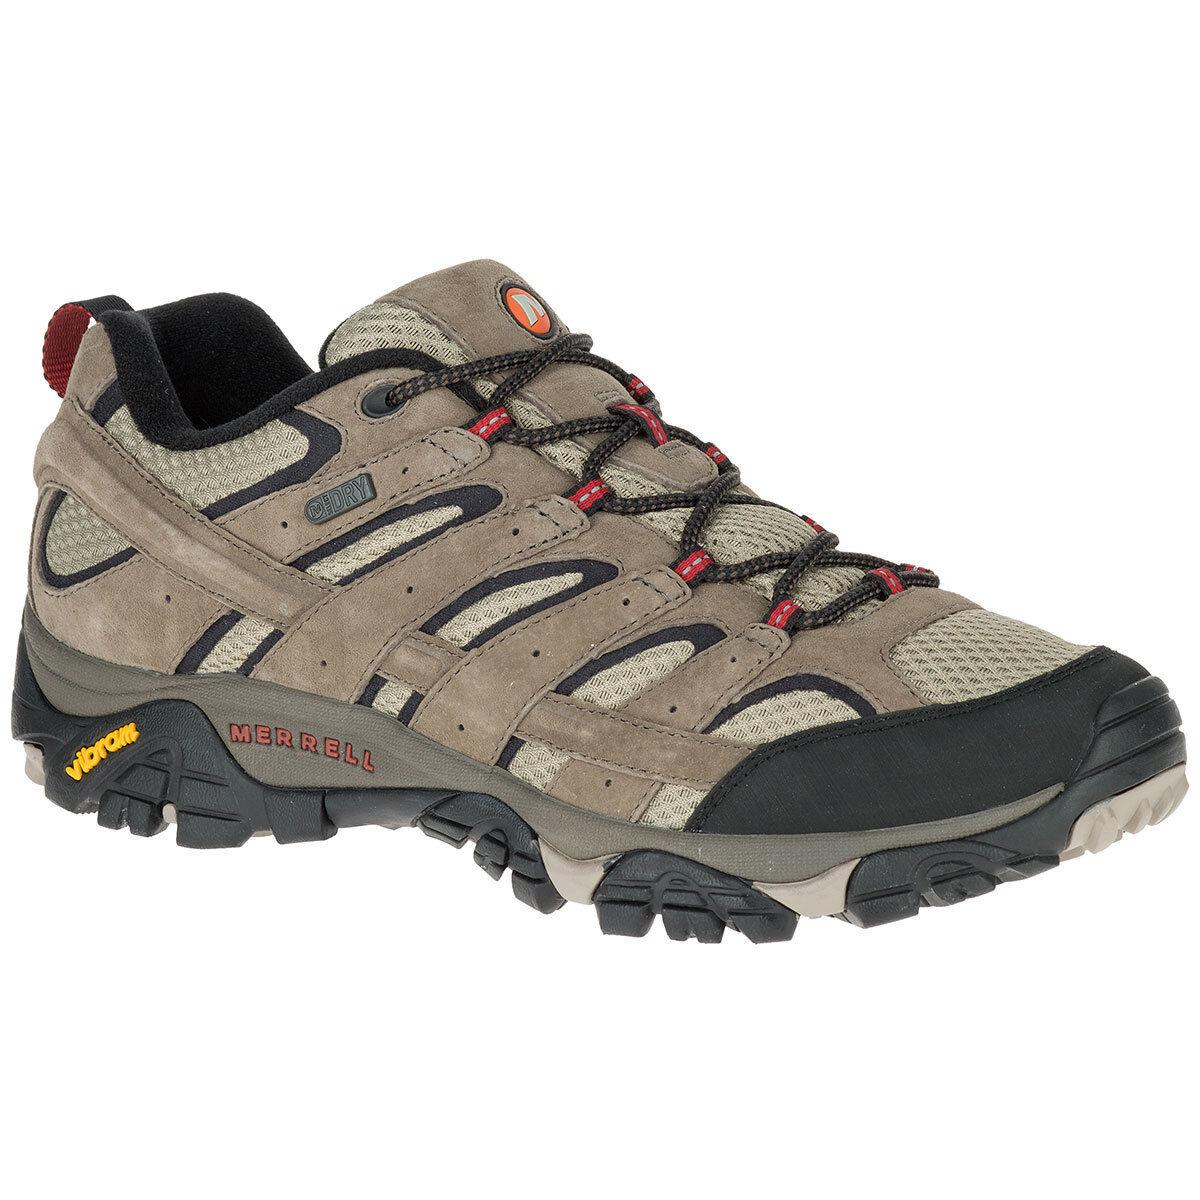 Merrell Men's Moab 2 Waterproof Low Hiking Shoes, Bark Brown - Size 11.5